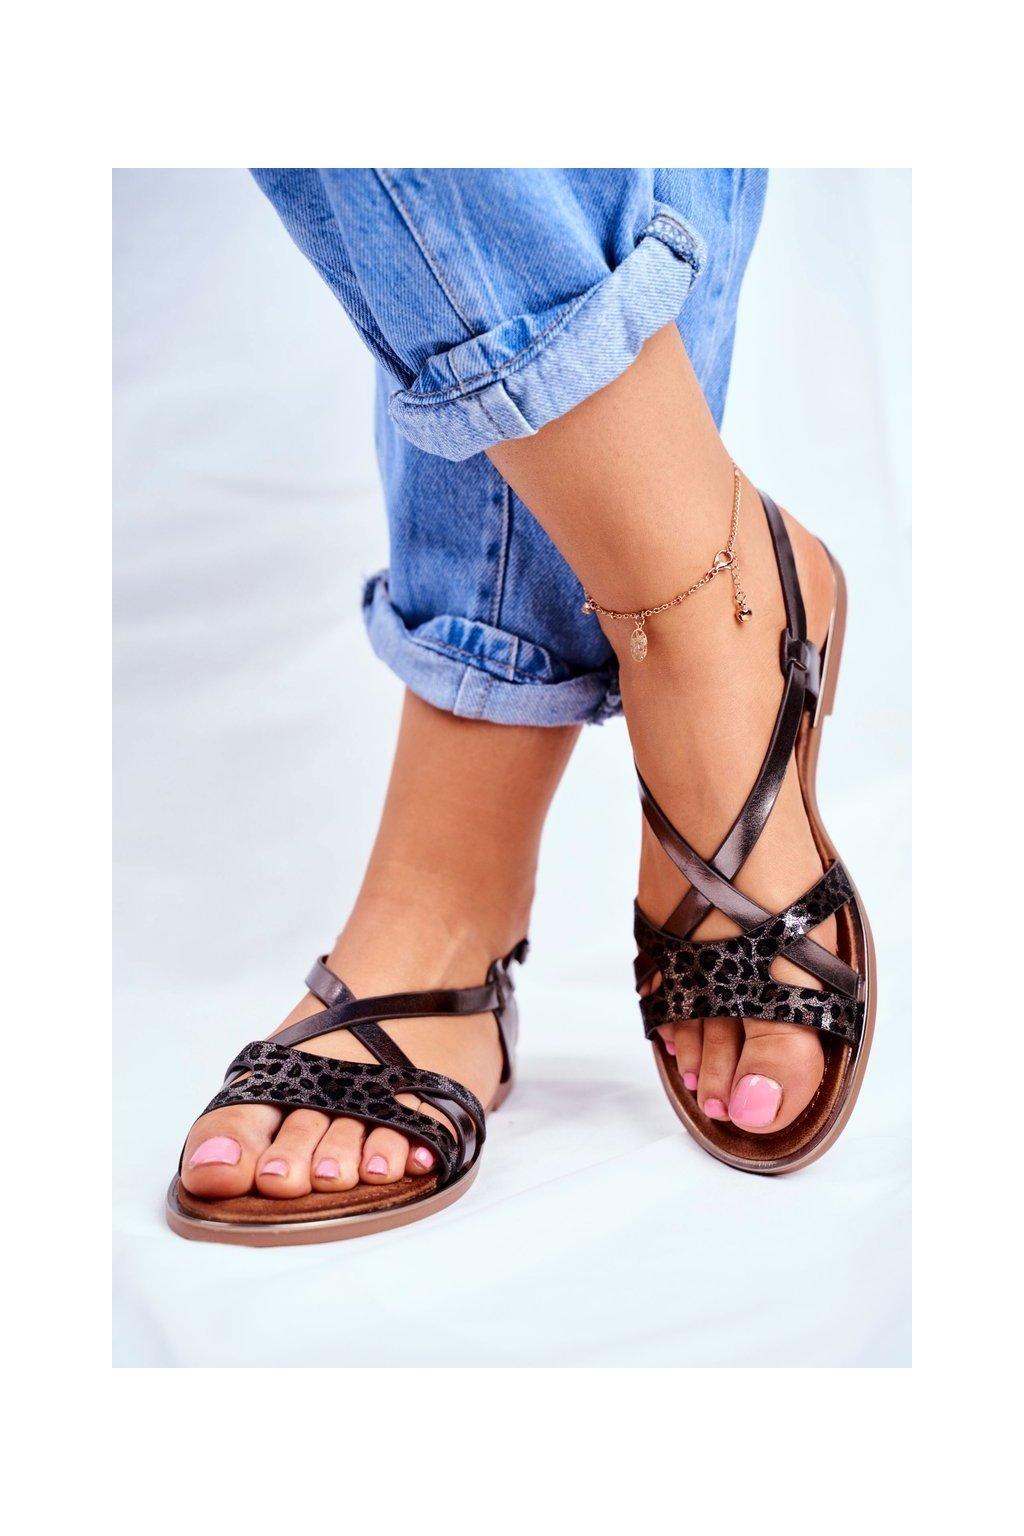 Dámske sandále s plochou podrážkou farba čierna kód obuvi 729-43 PEWTER